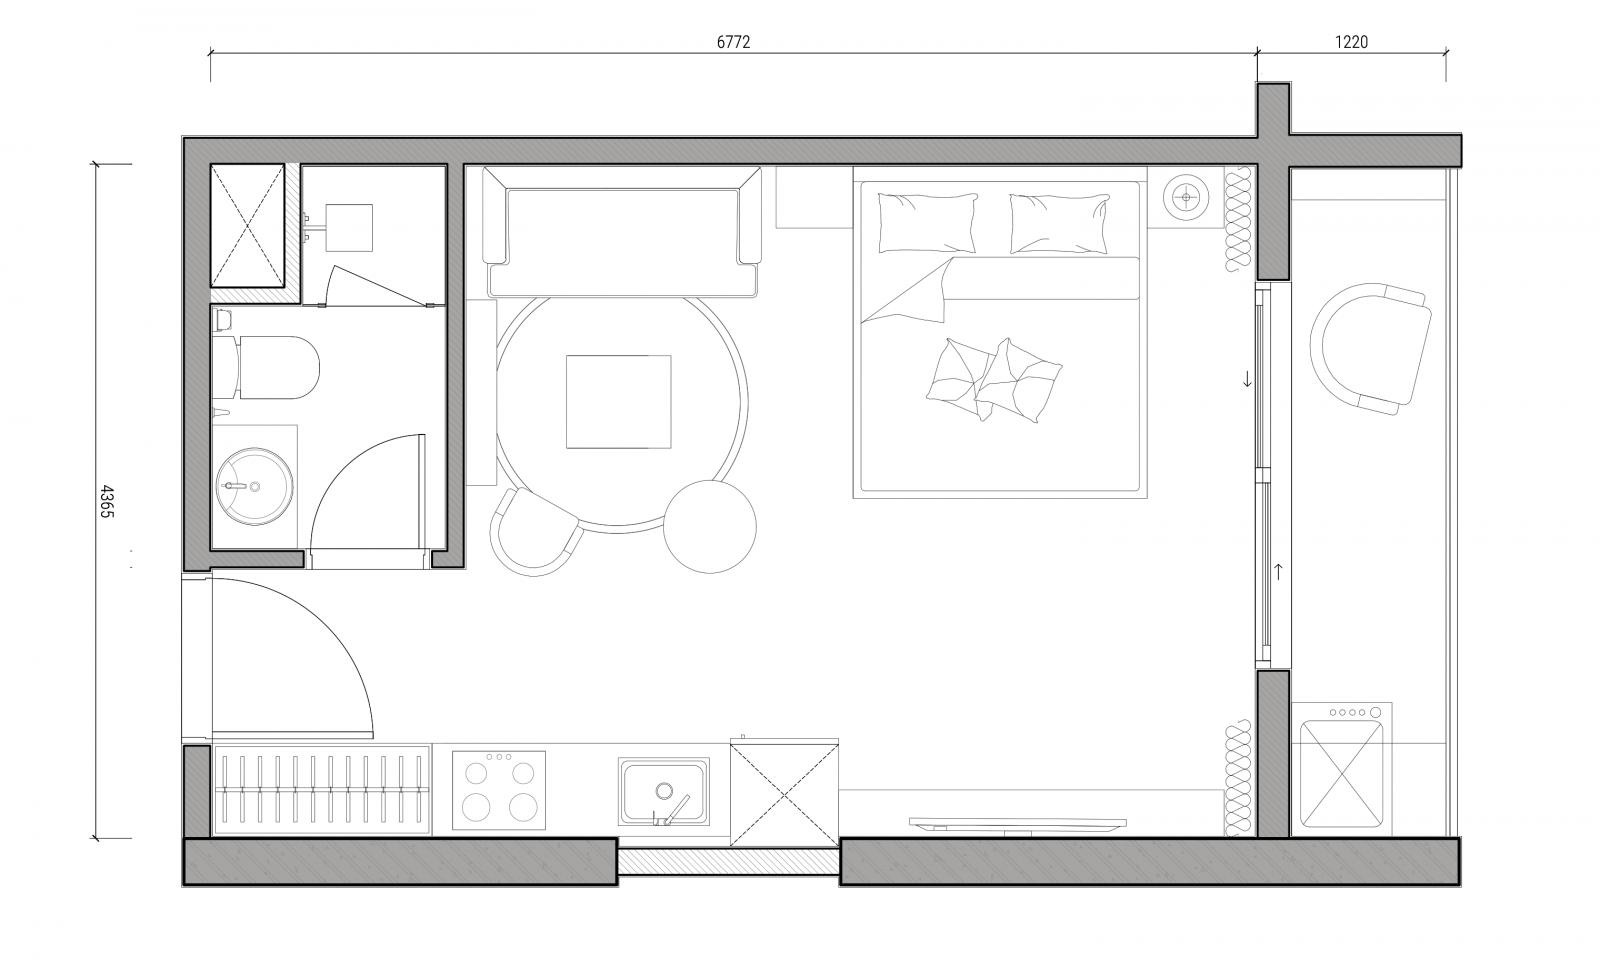 mặt bằng căn hộ 35m2